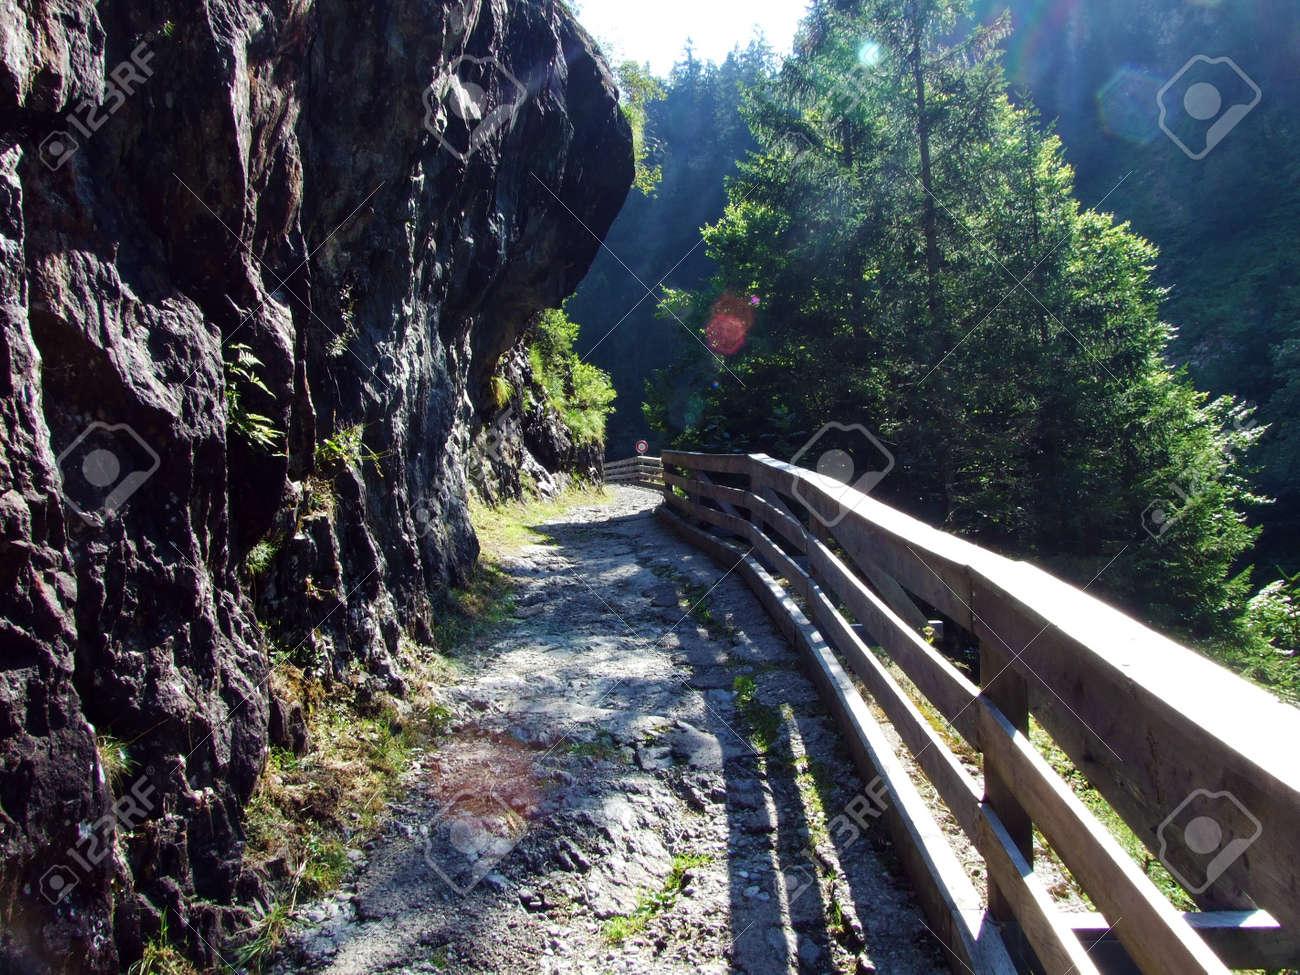 Stones and rocks in the Maderanertal alpine valley - Canton of Uri, Switzerland - 158089673